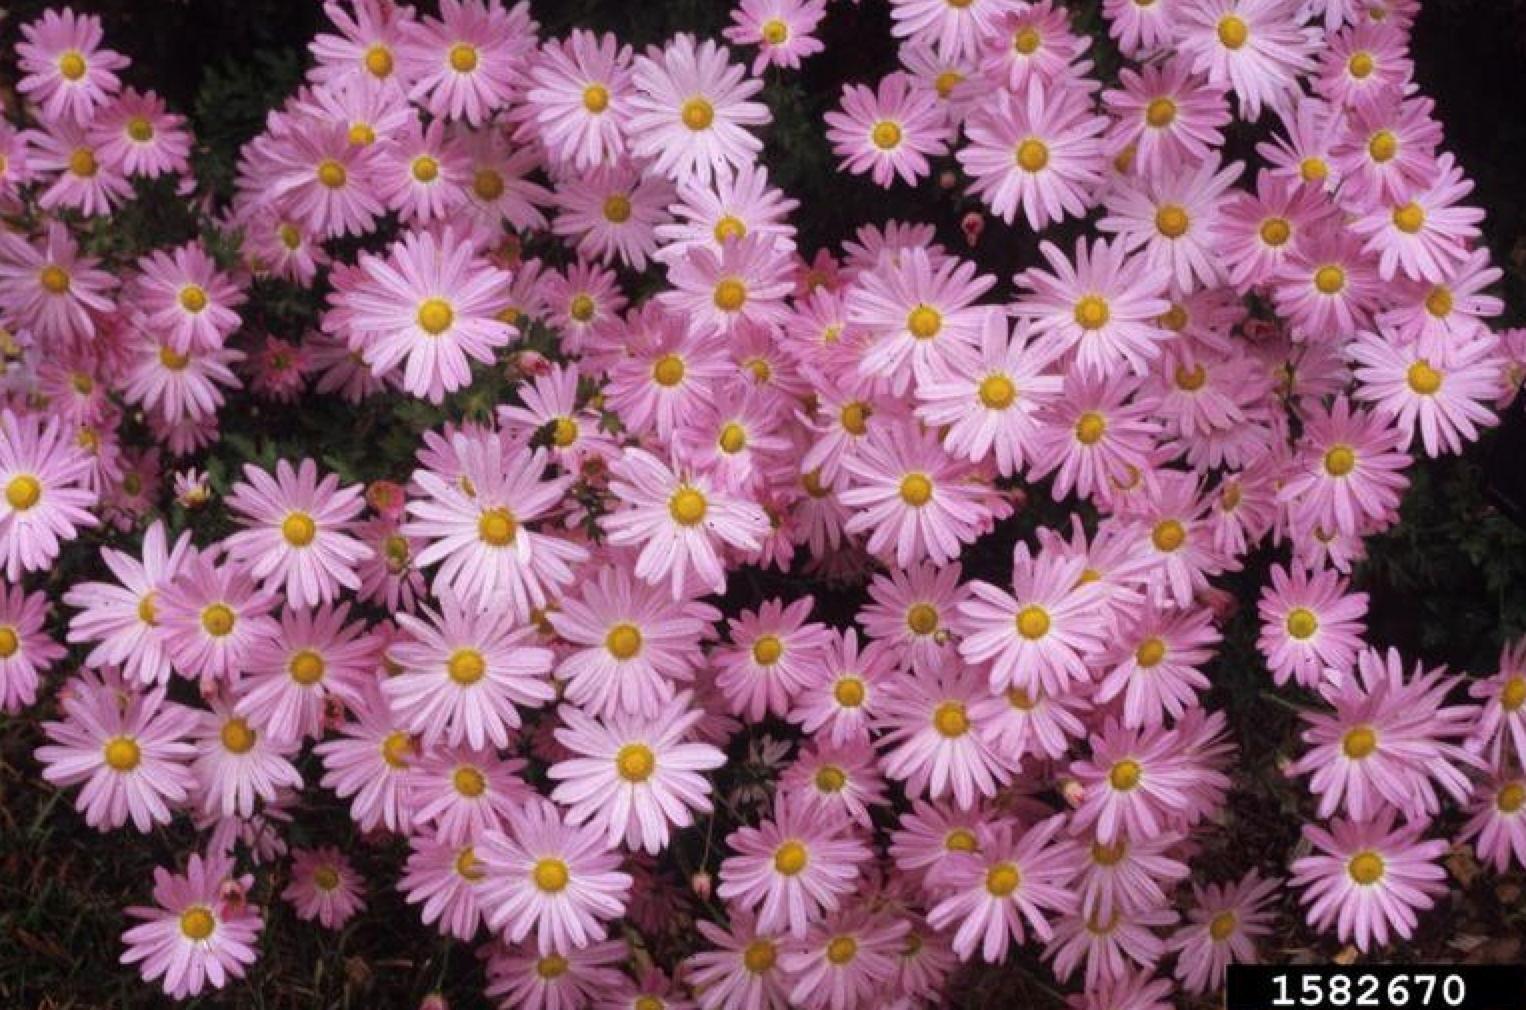 Chrysanthemum Community Environment Nebraska